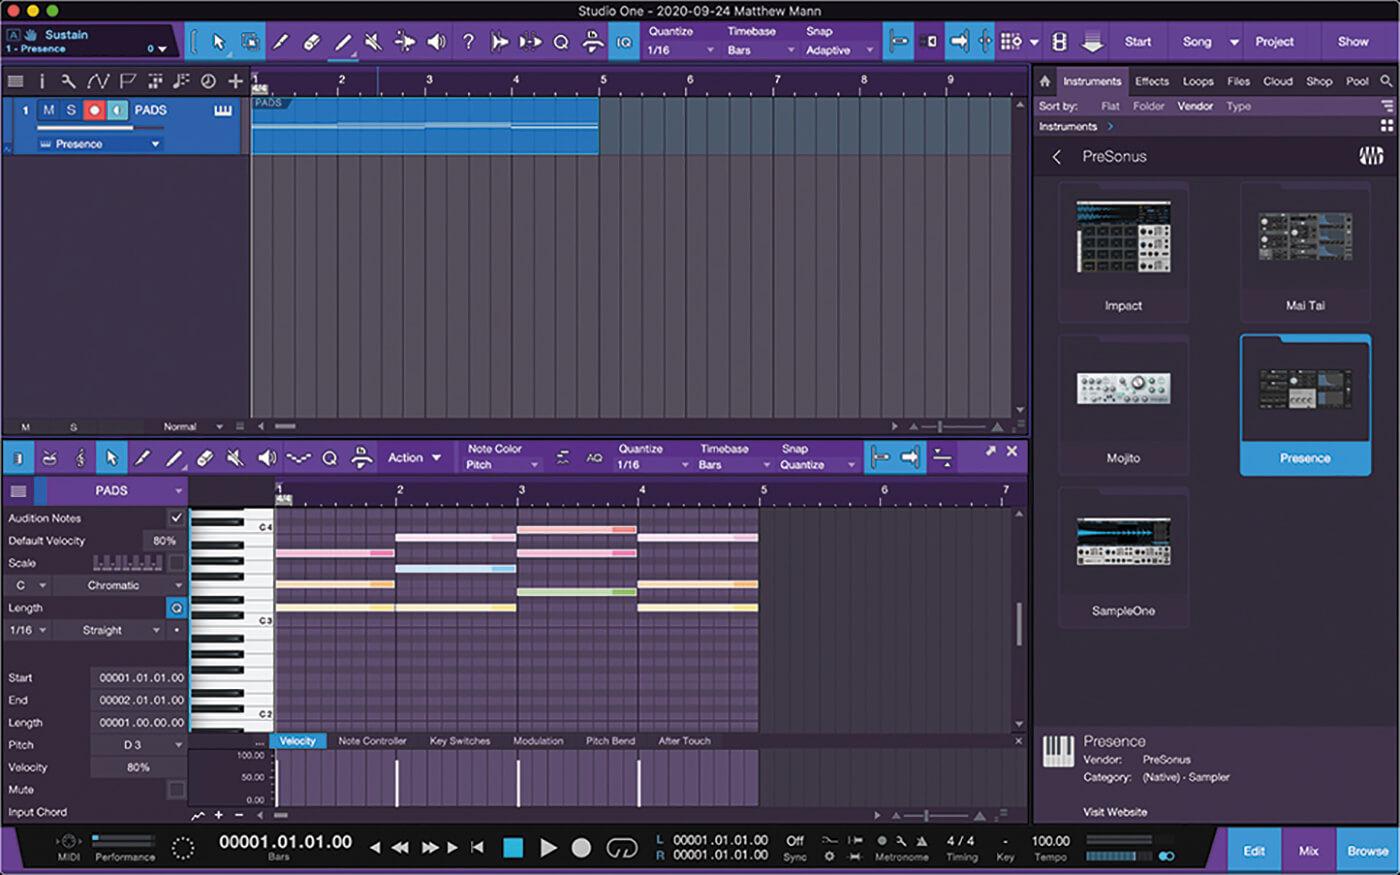 PreSonus Studio One Side Chain 2